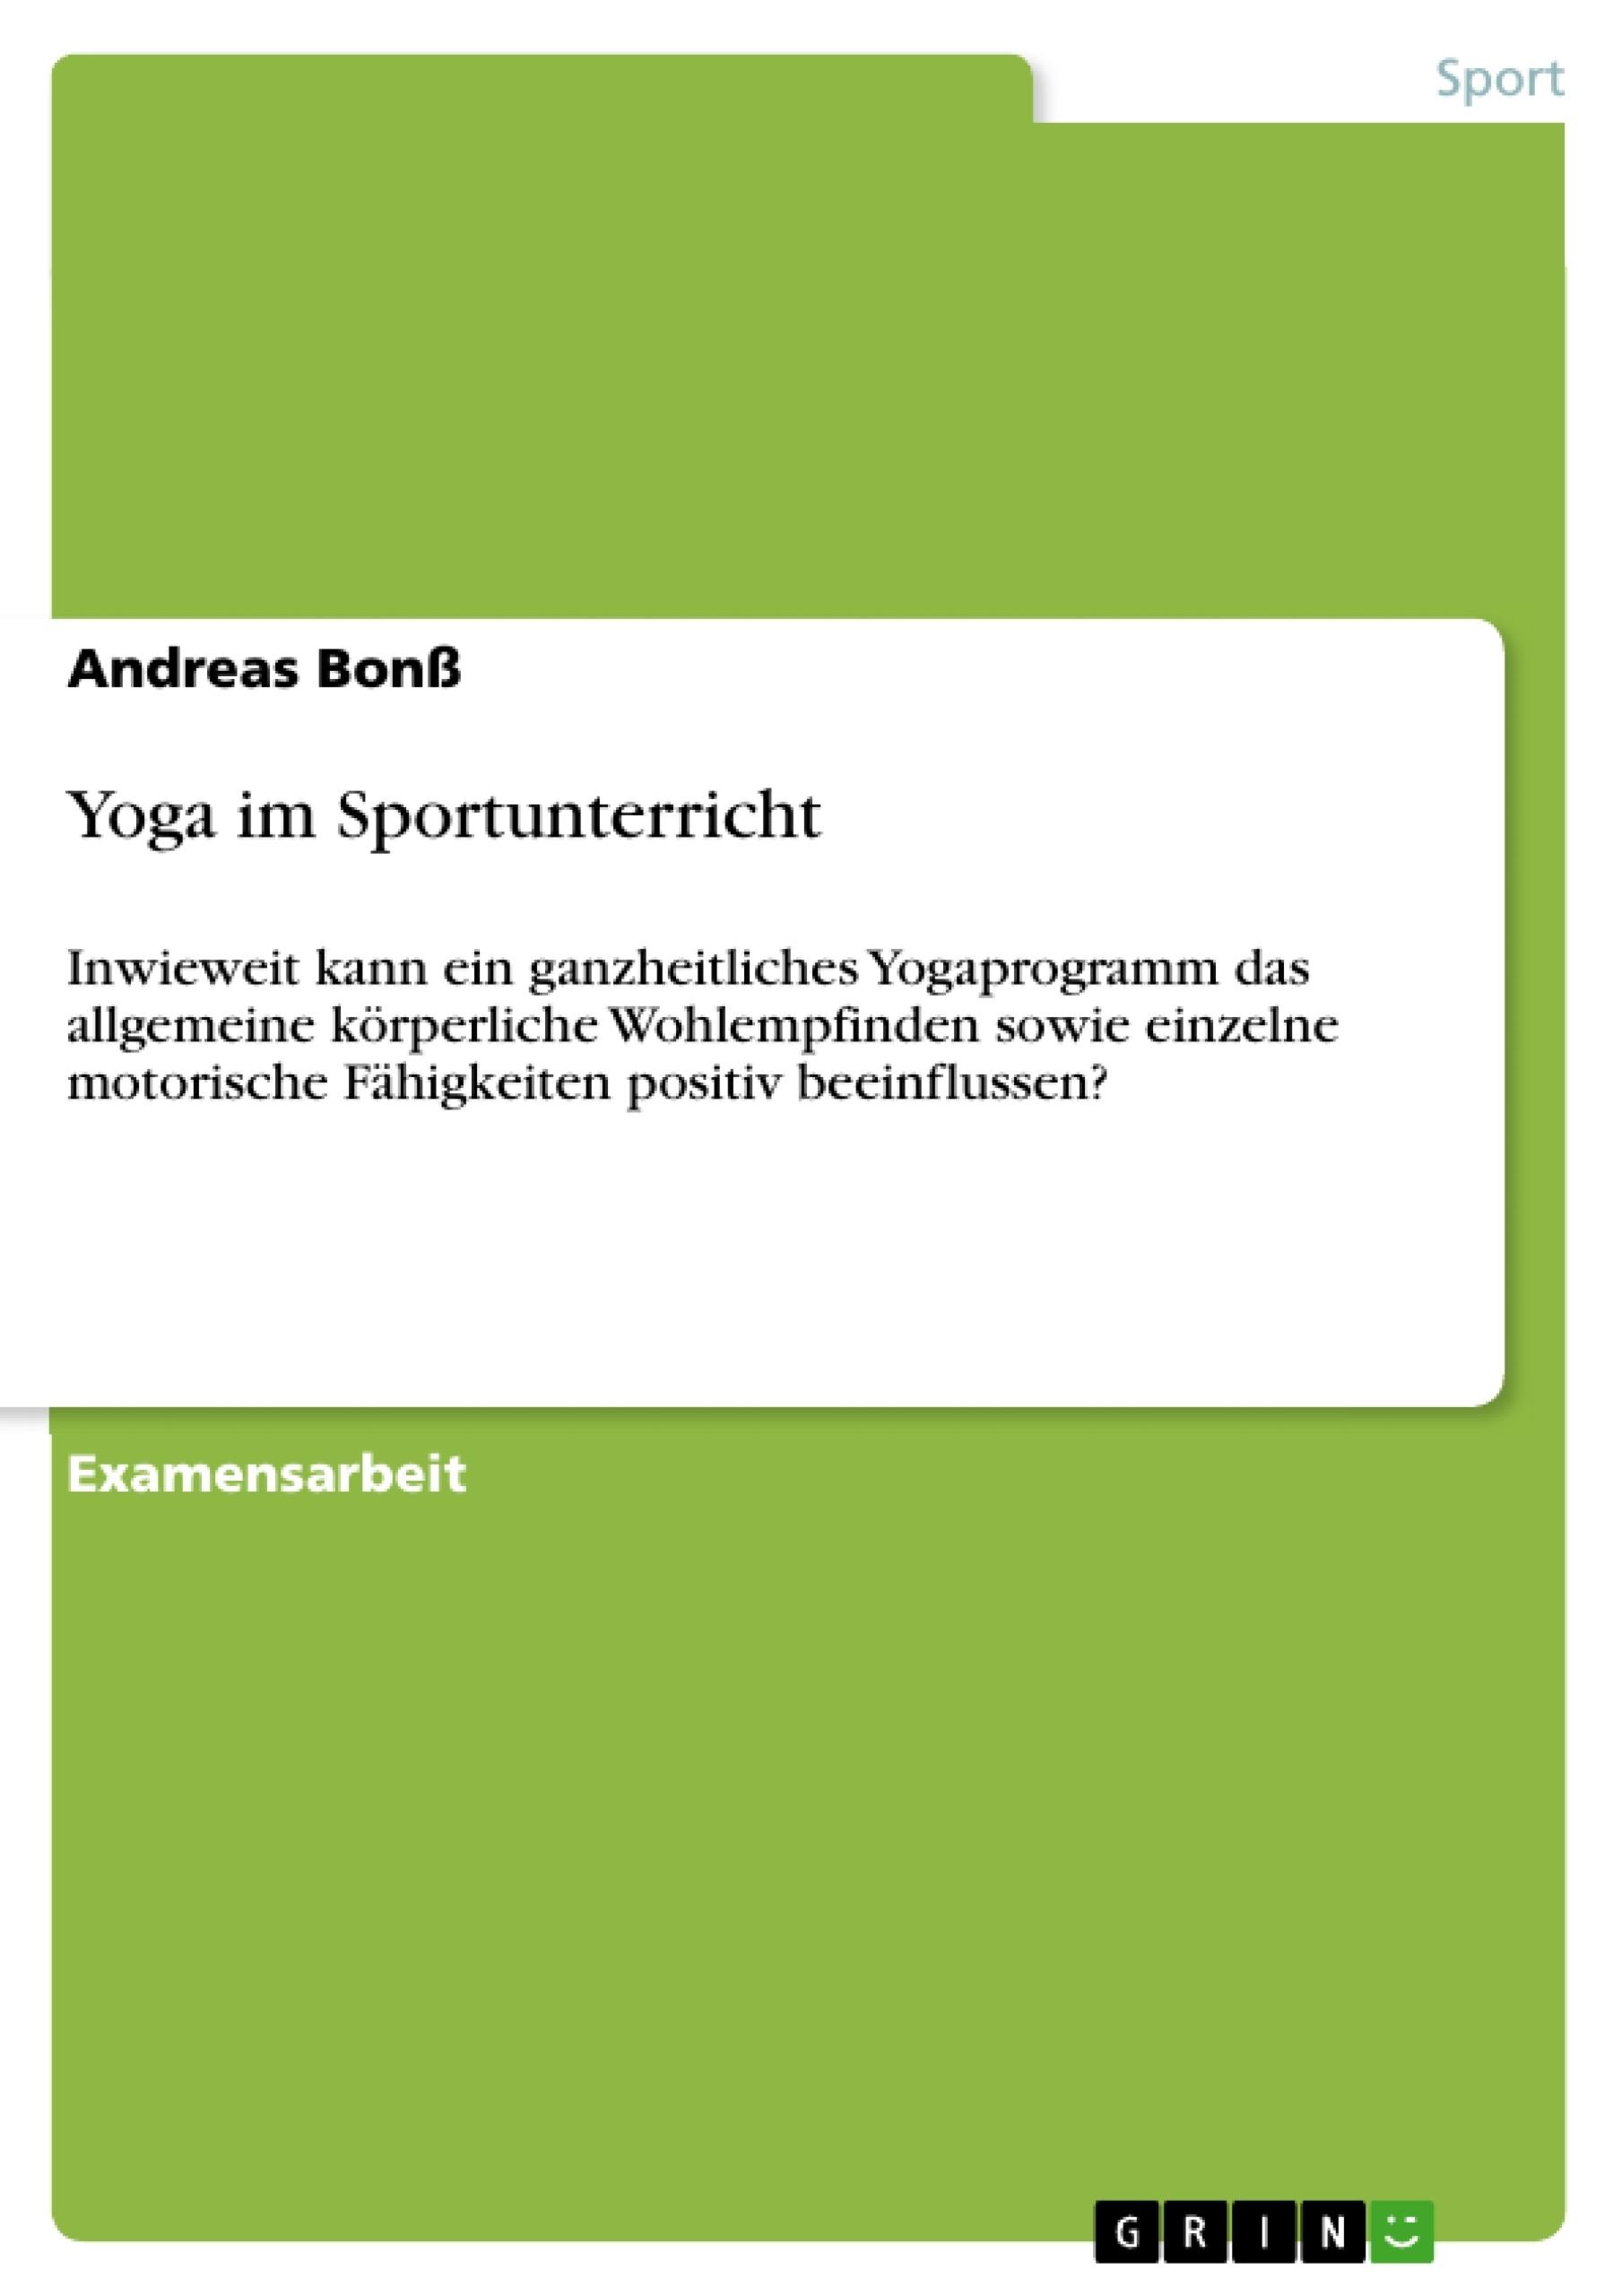 Titel: Yoga im Sportunterricht